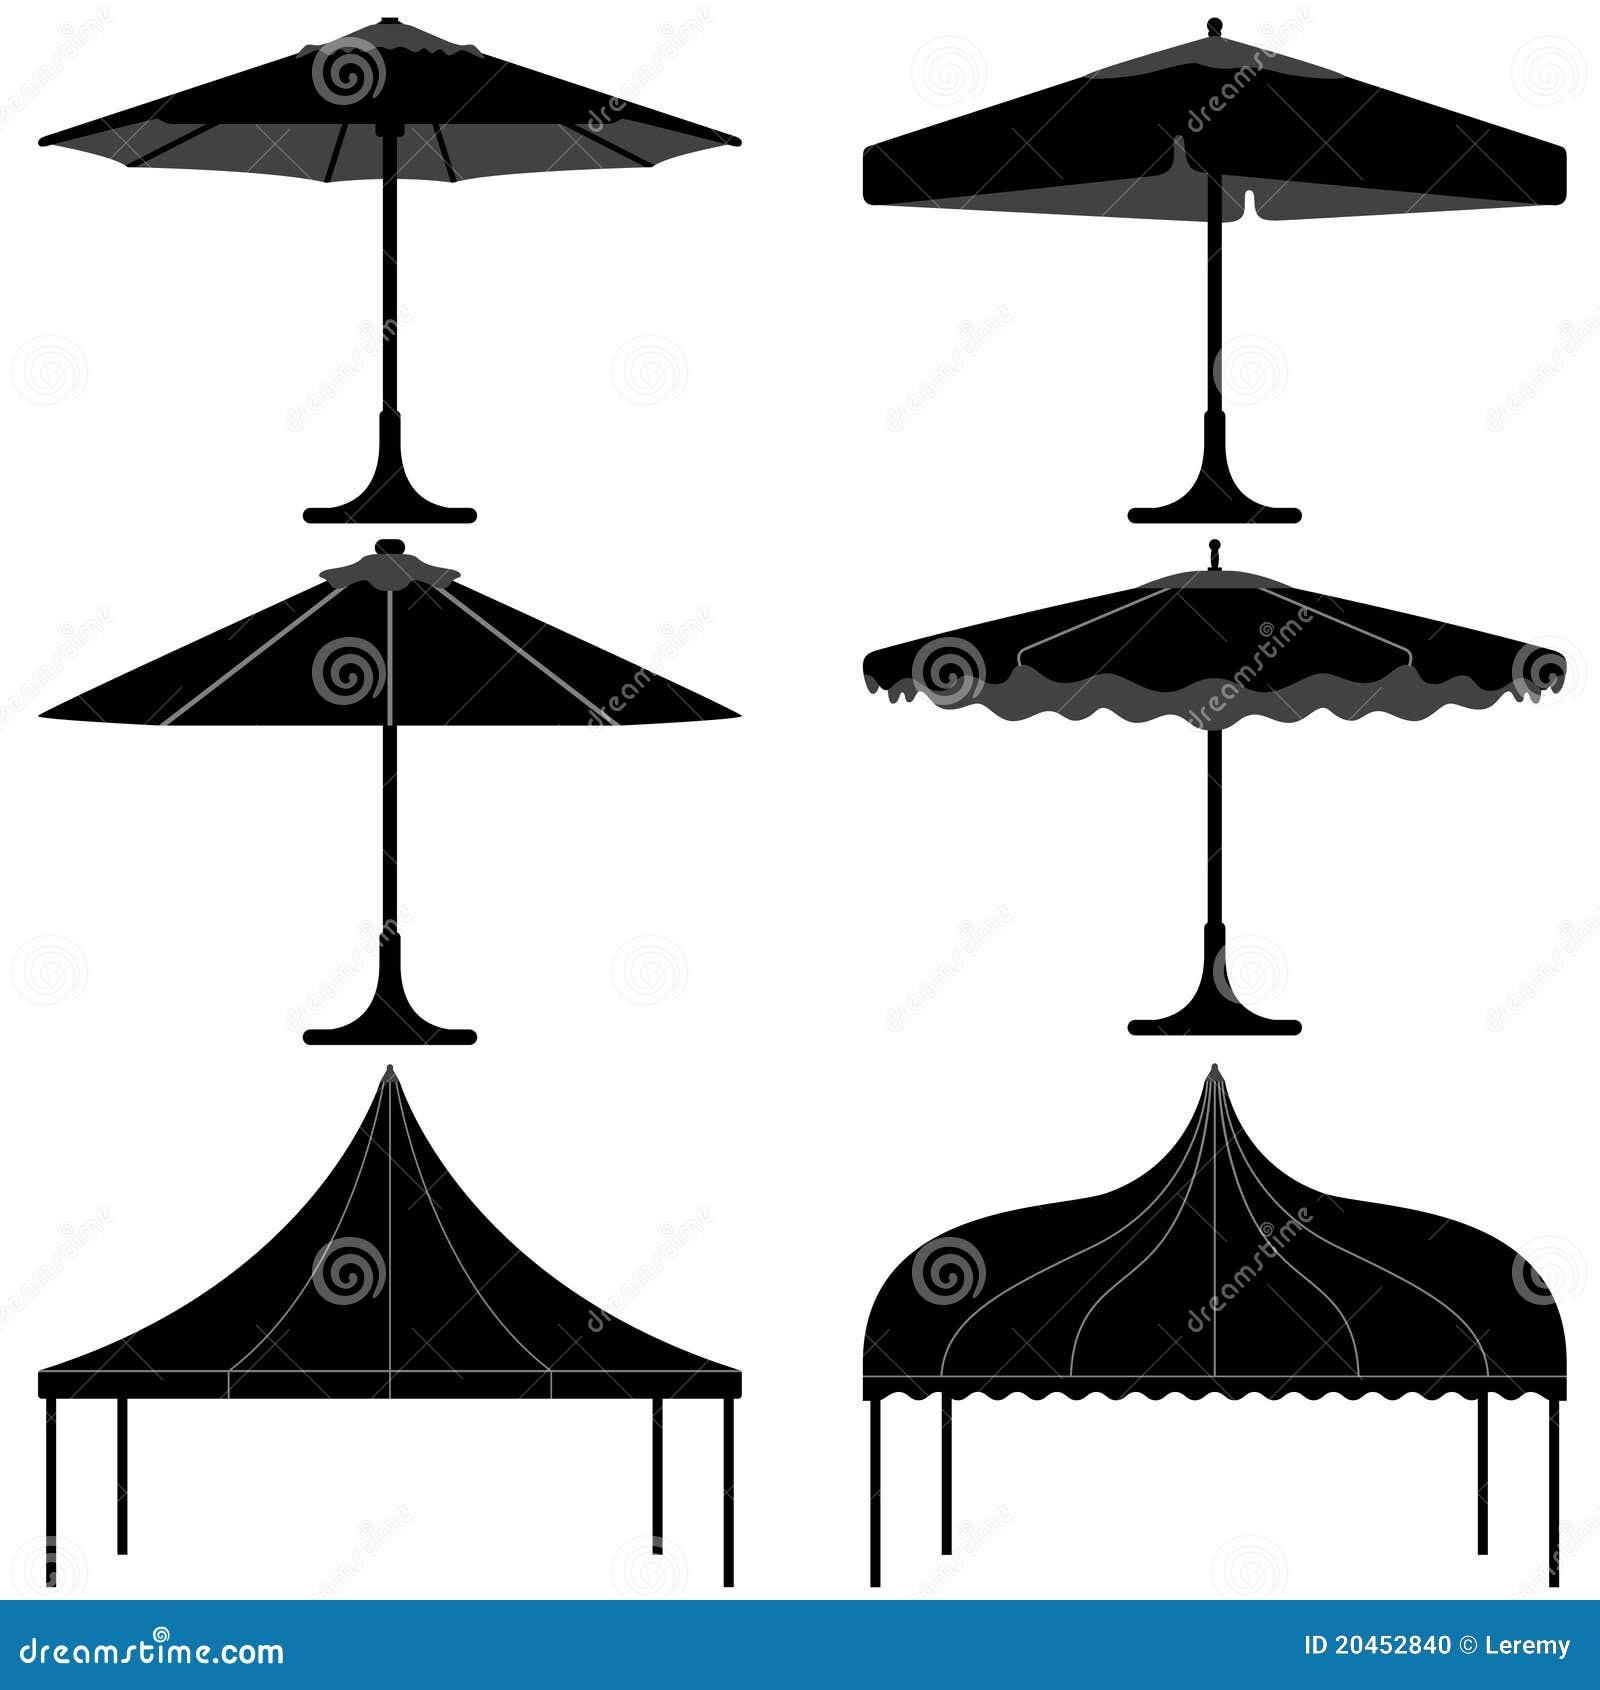 Umbrella Tent Gazebo Canopy Camp Silhouette Stock Photo - Image ...